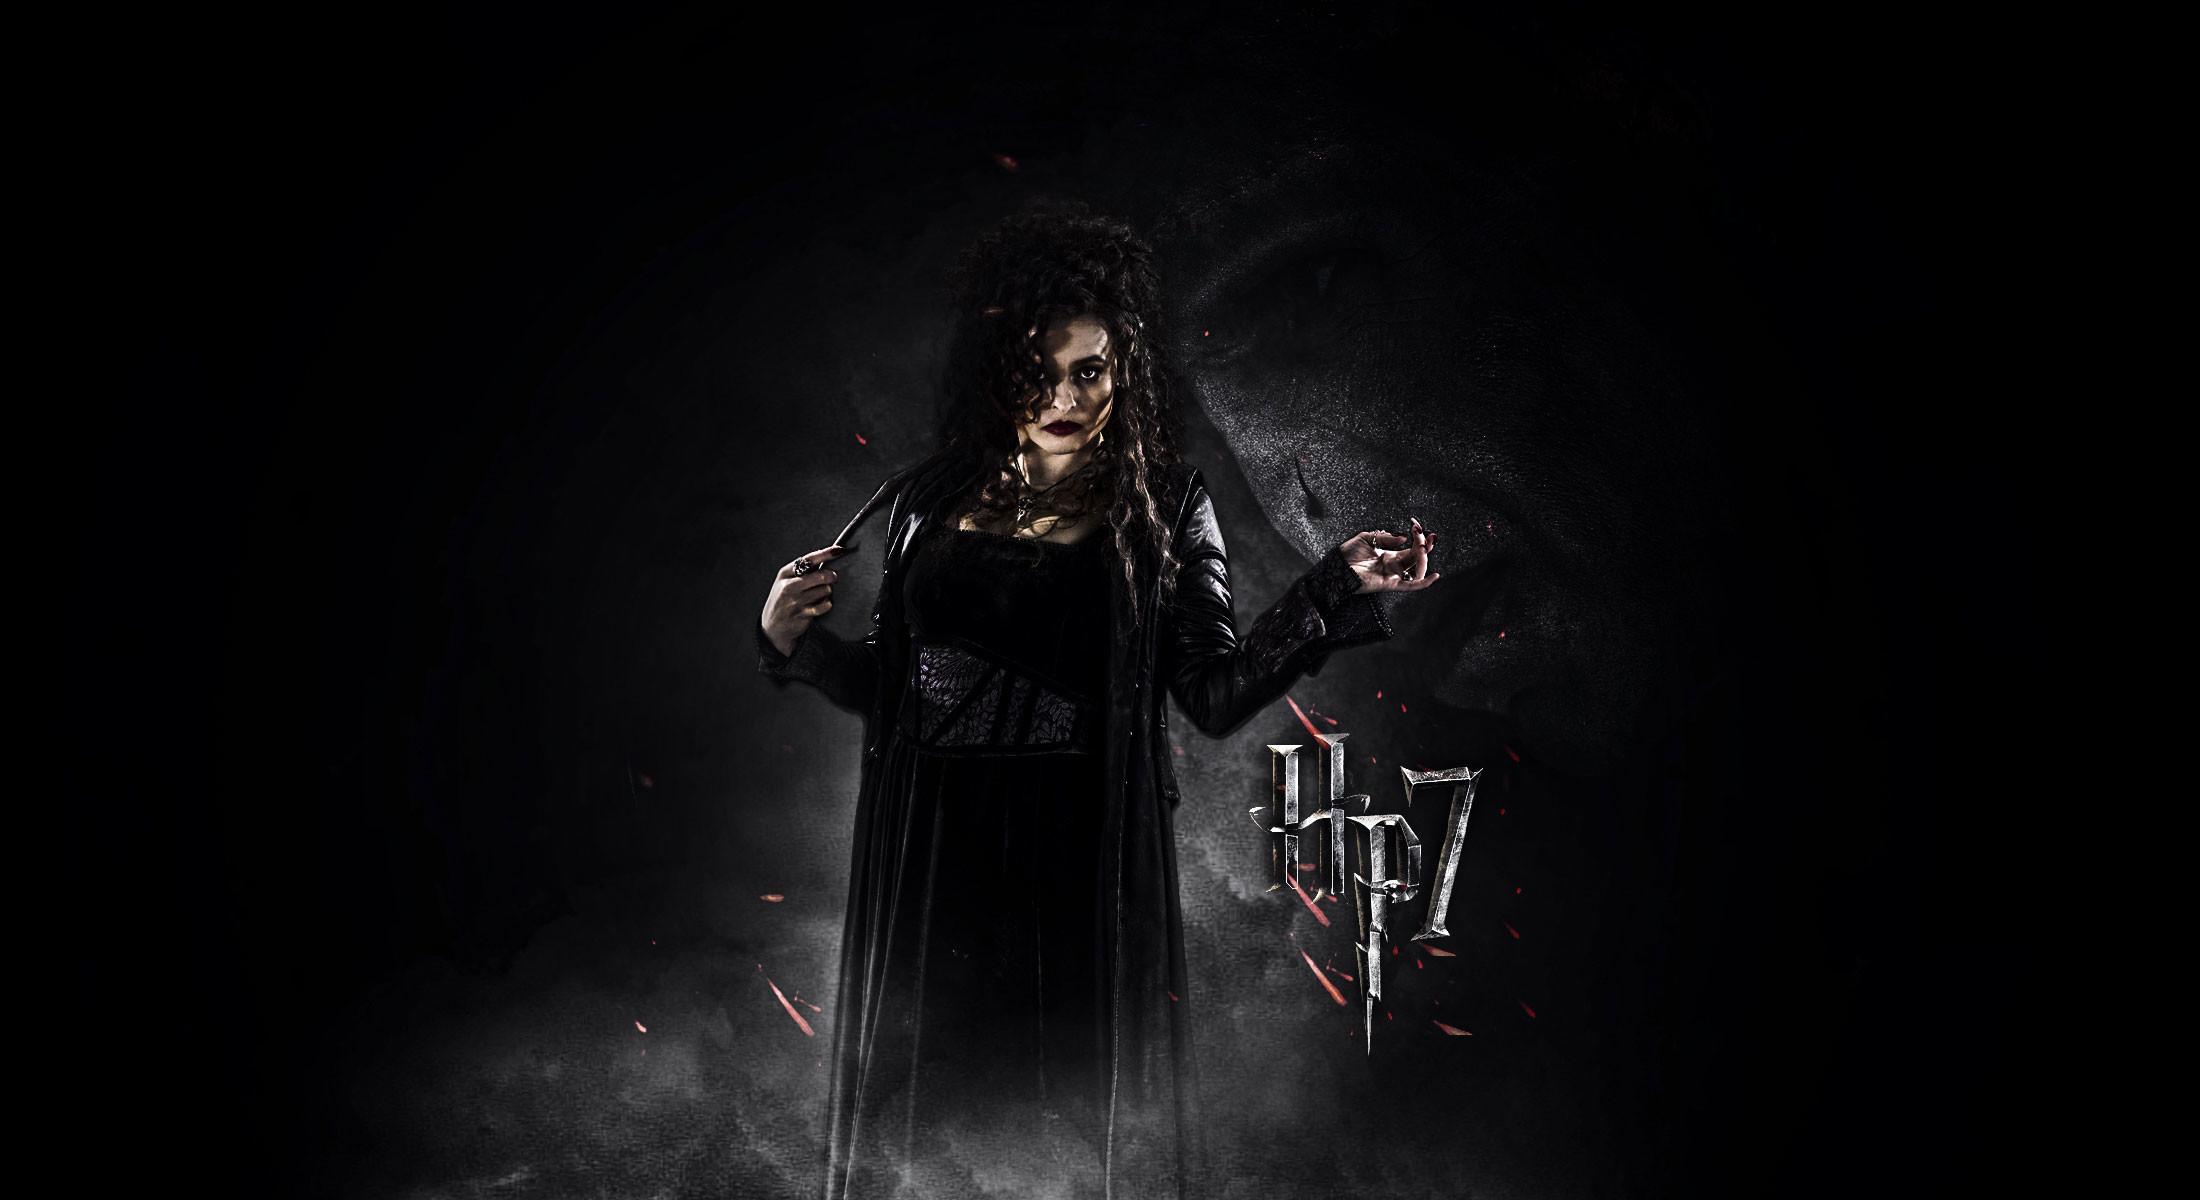 Harry Potter DH – Bellatrix Lestrange wallpaper